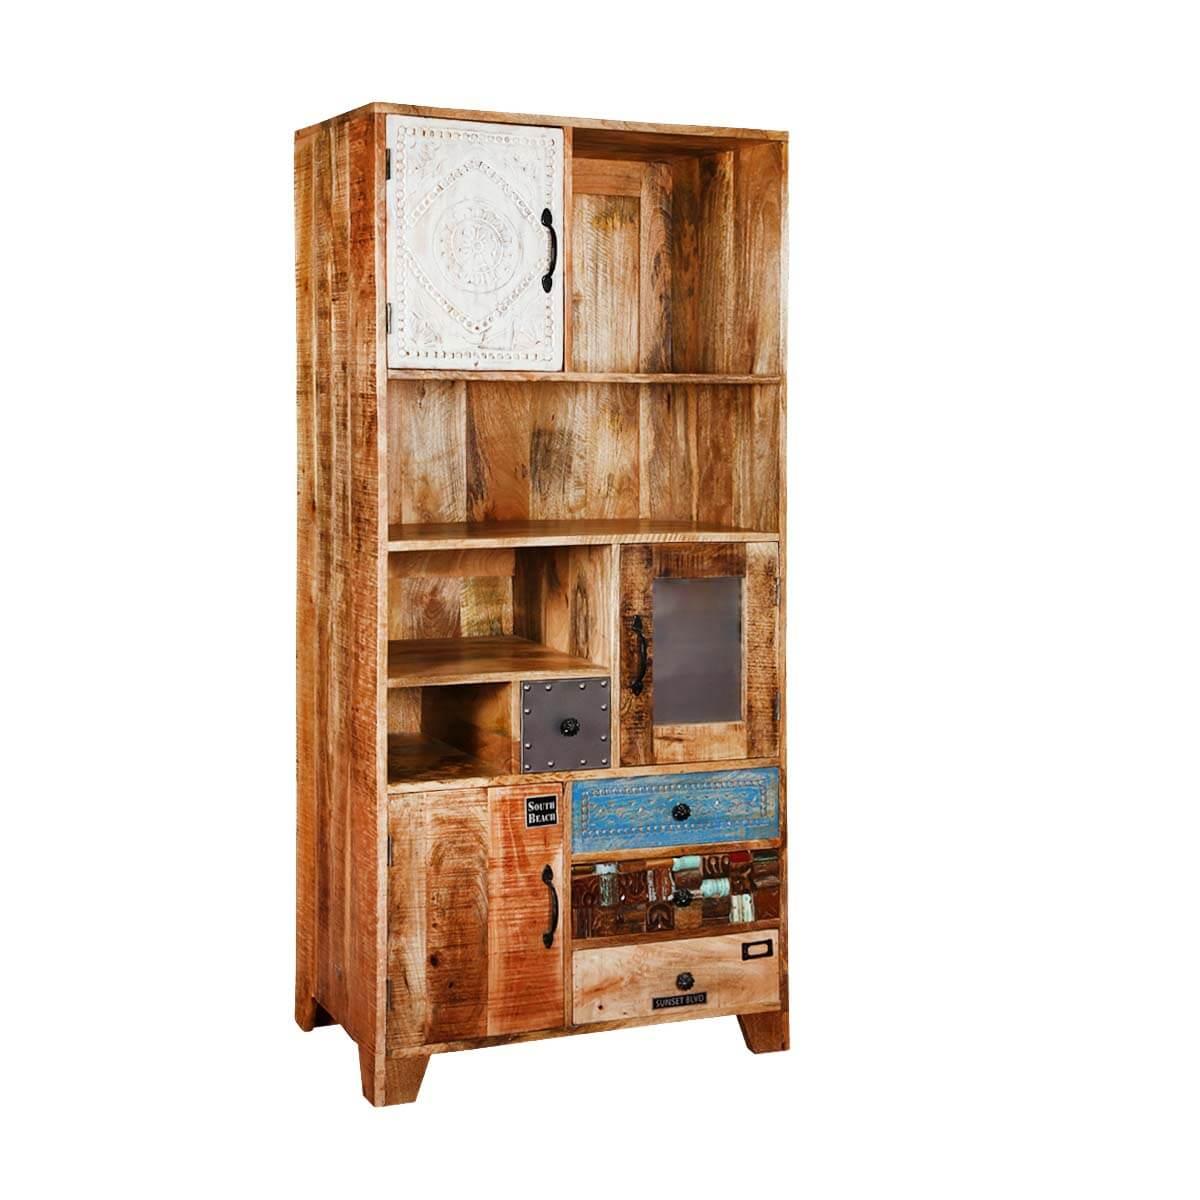 Arkansas Distinctive Iron and Mango Wood Rustic Storage